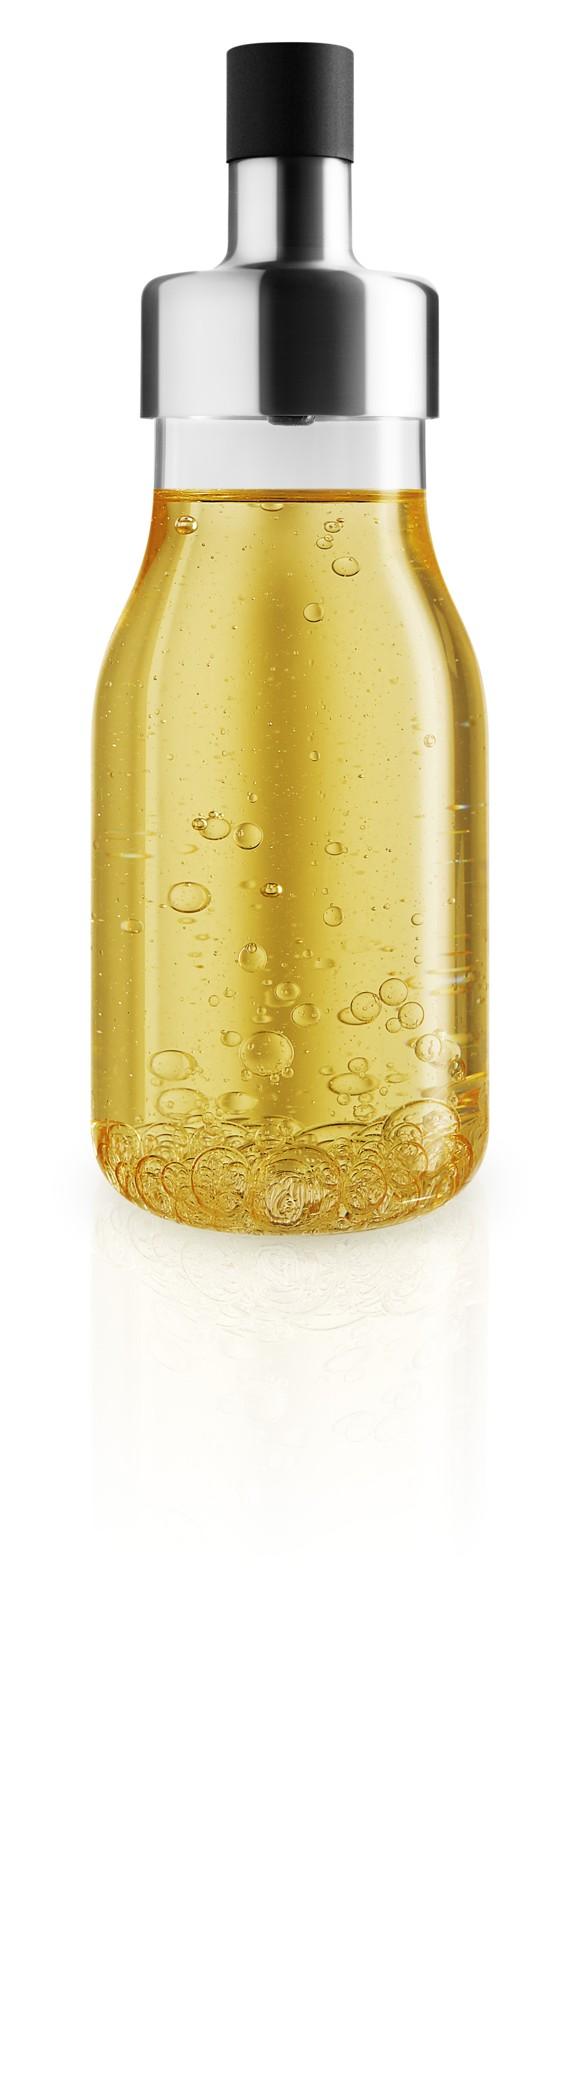 Eva Solo - MyFlavour Vinegar Shaker (567687)